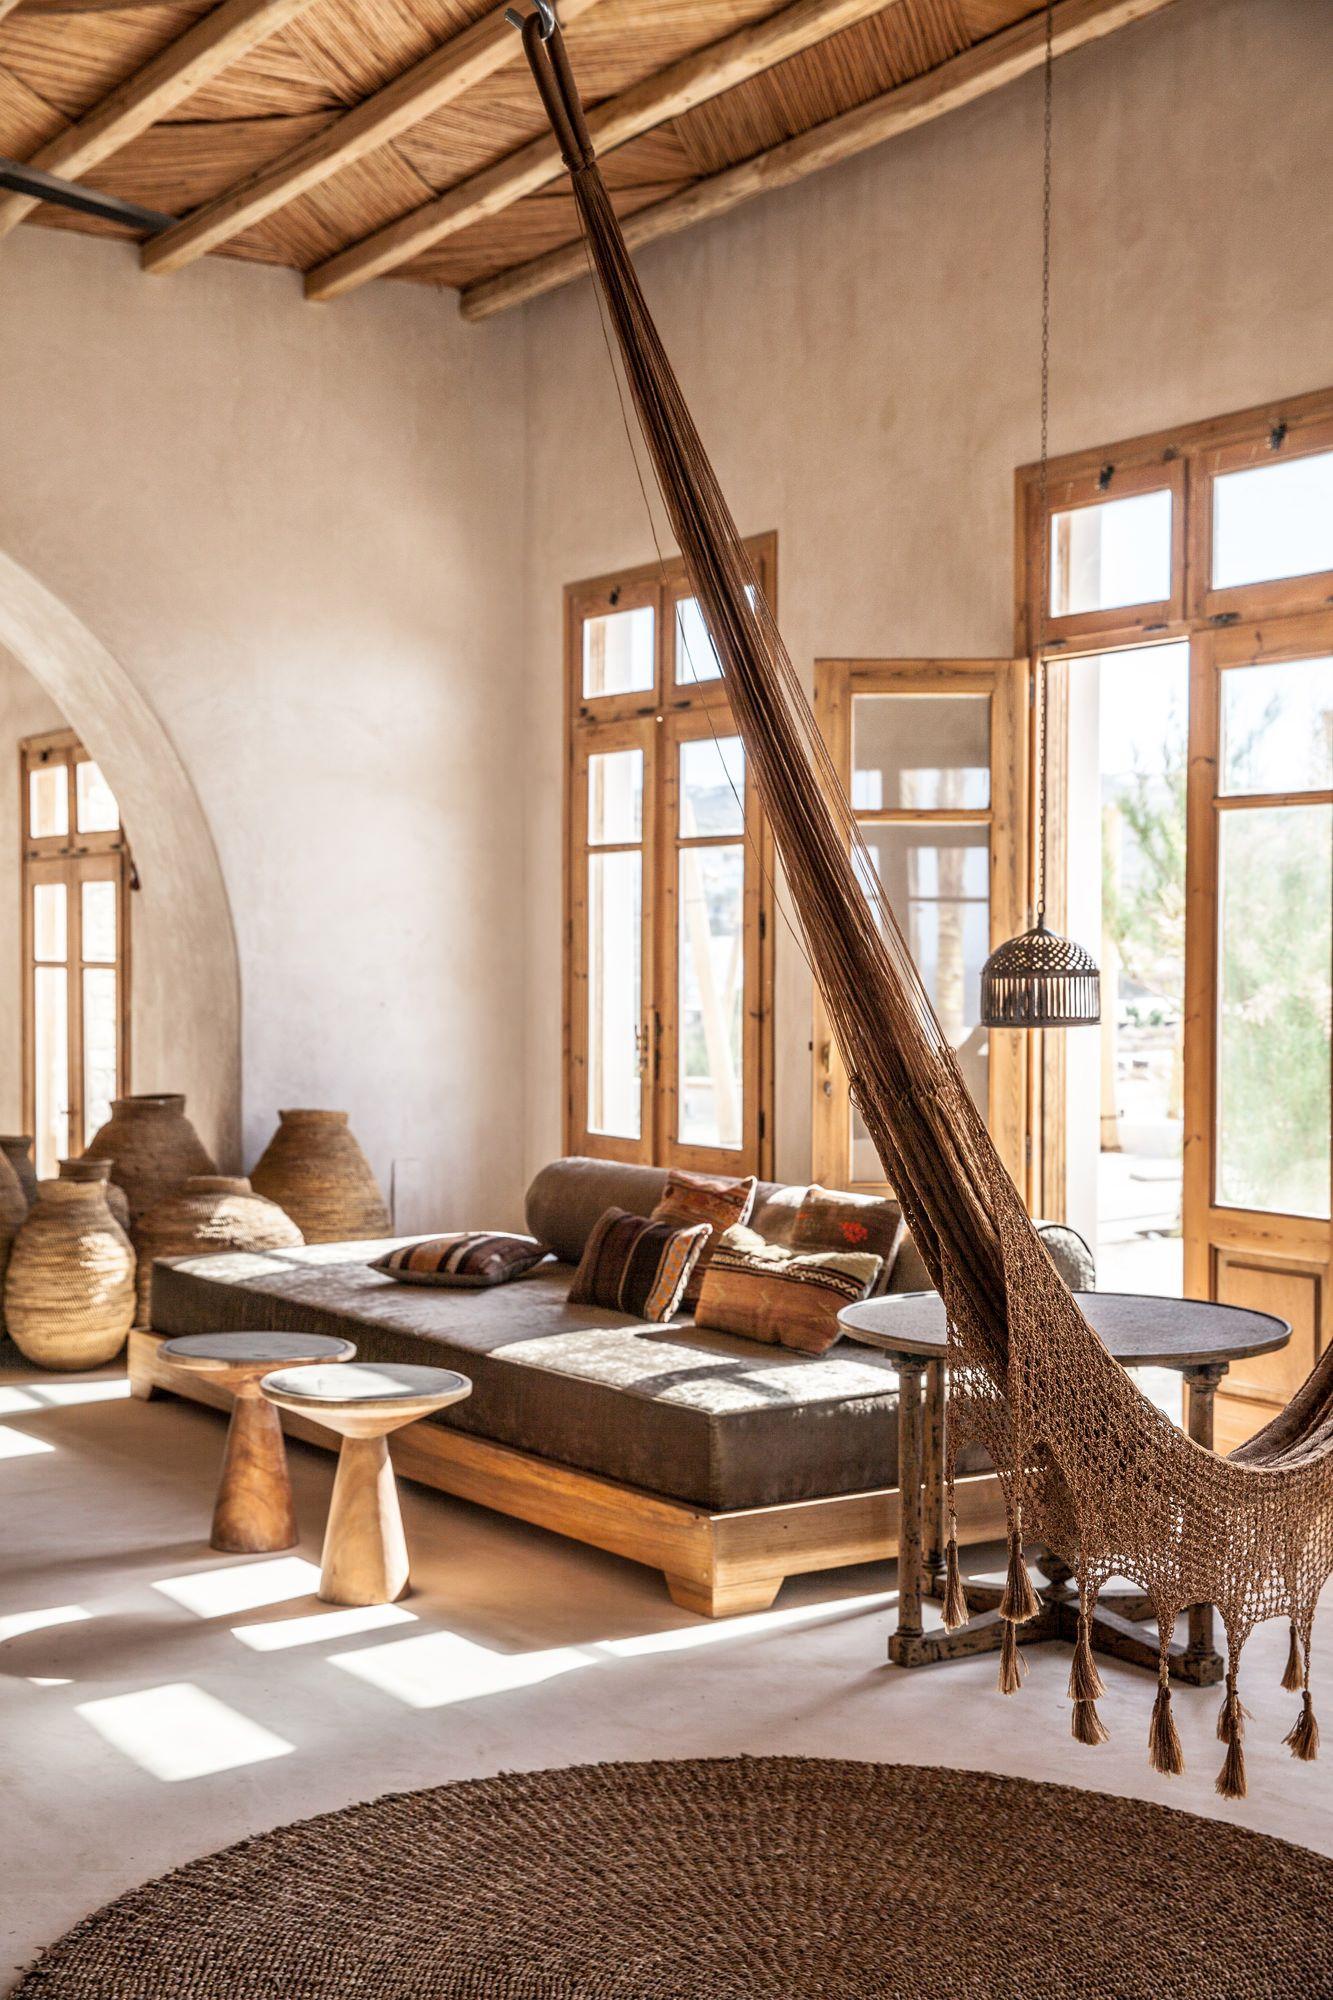 house rustieke interieurshotelinterieursdesigninterieursboheems